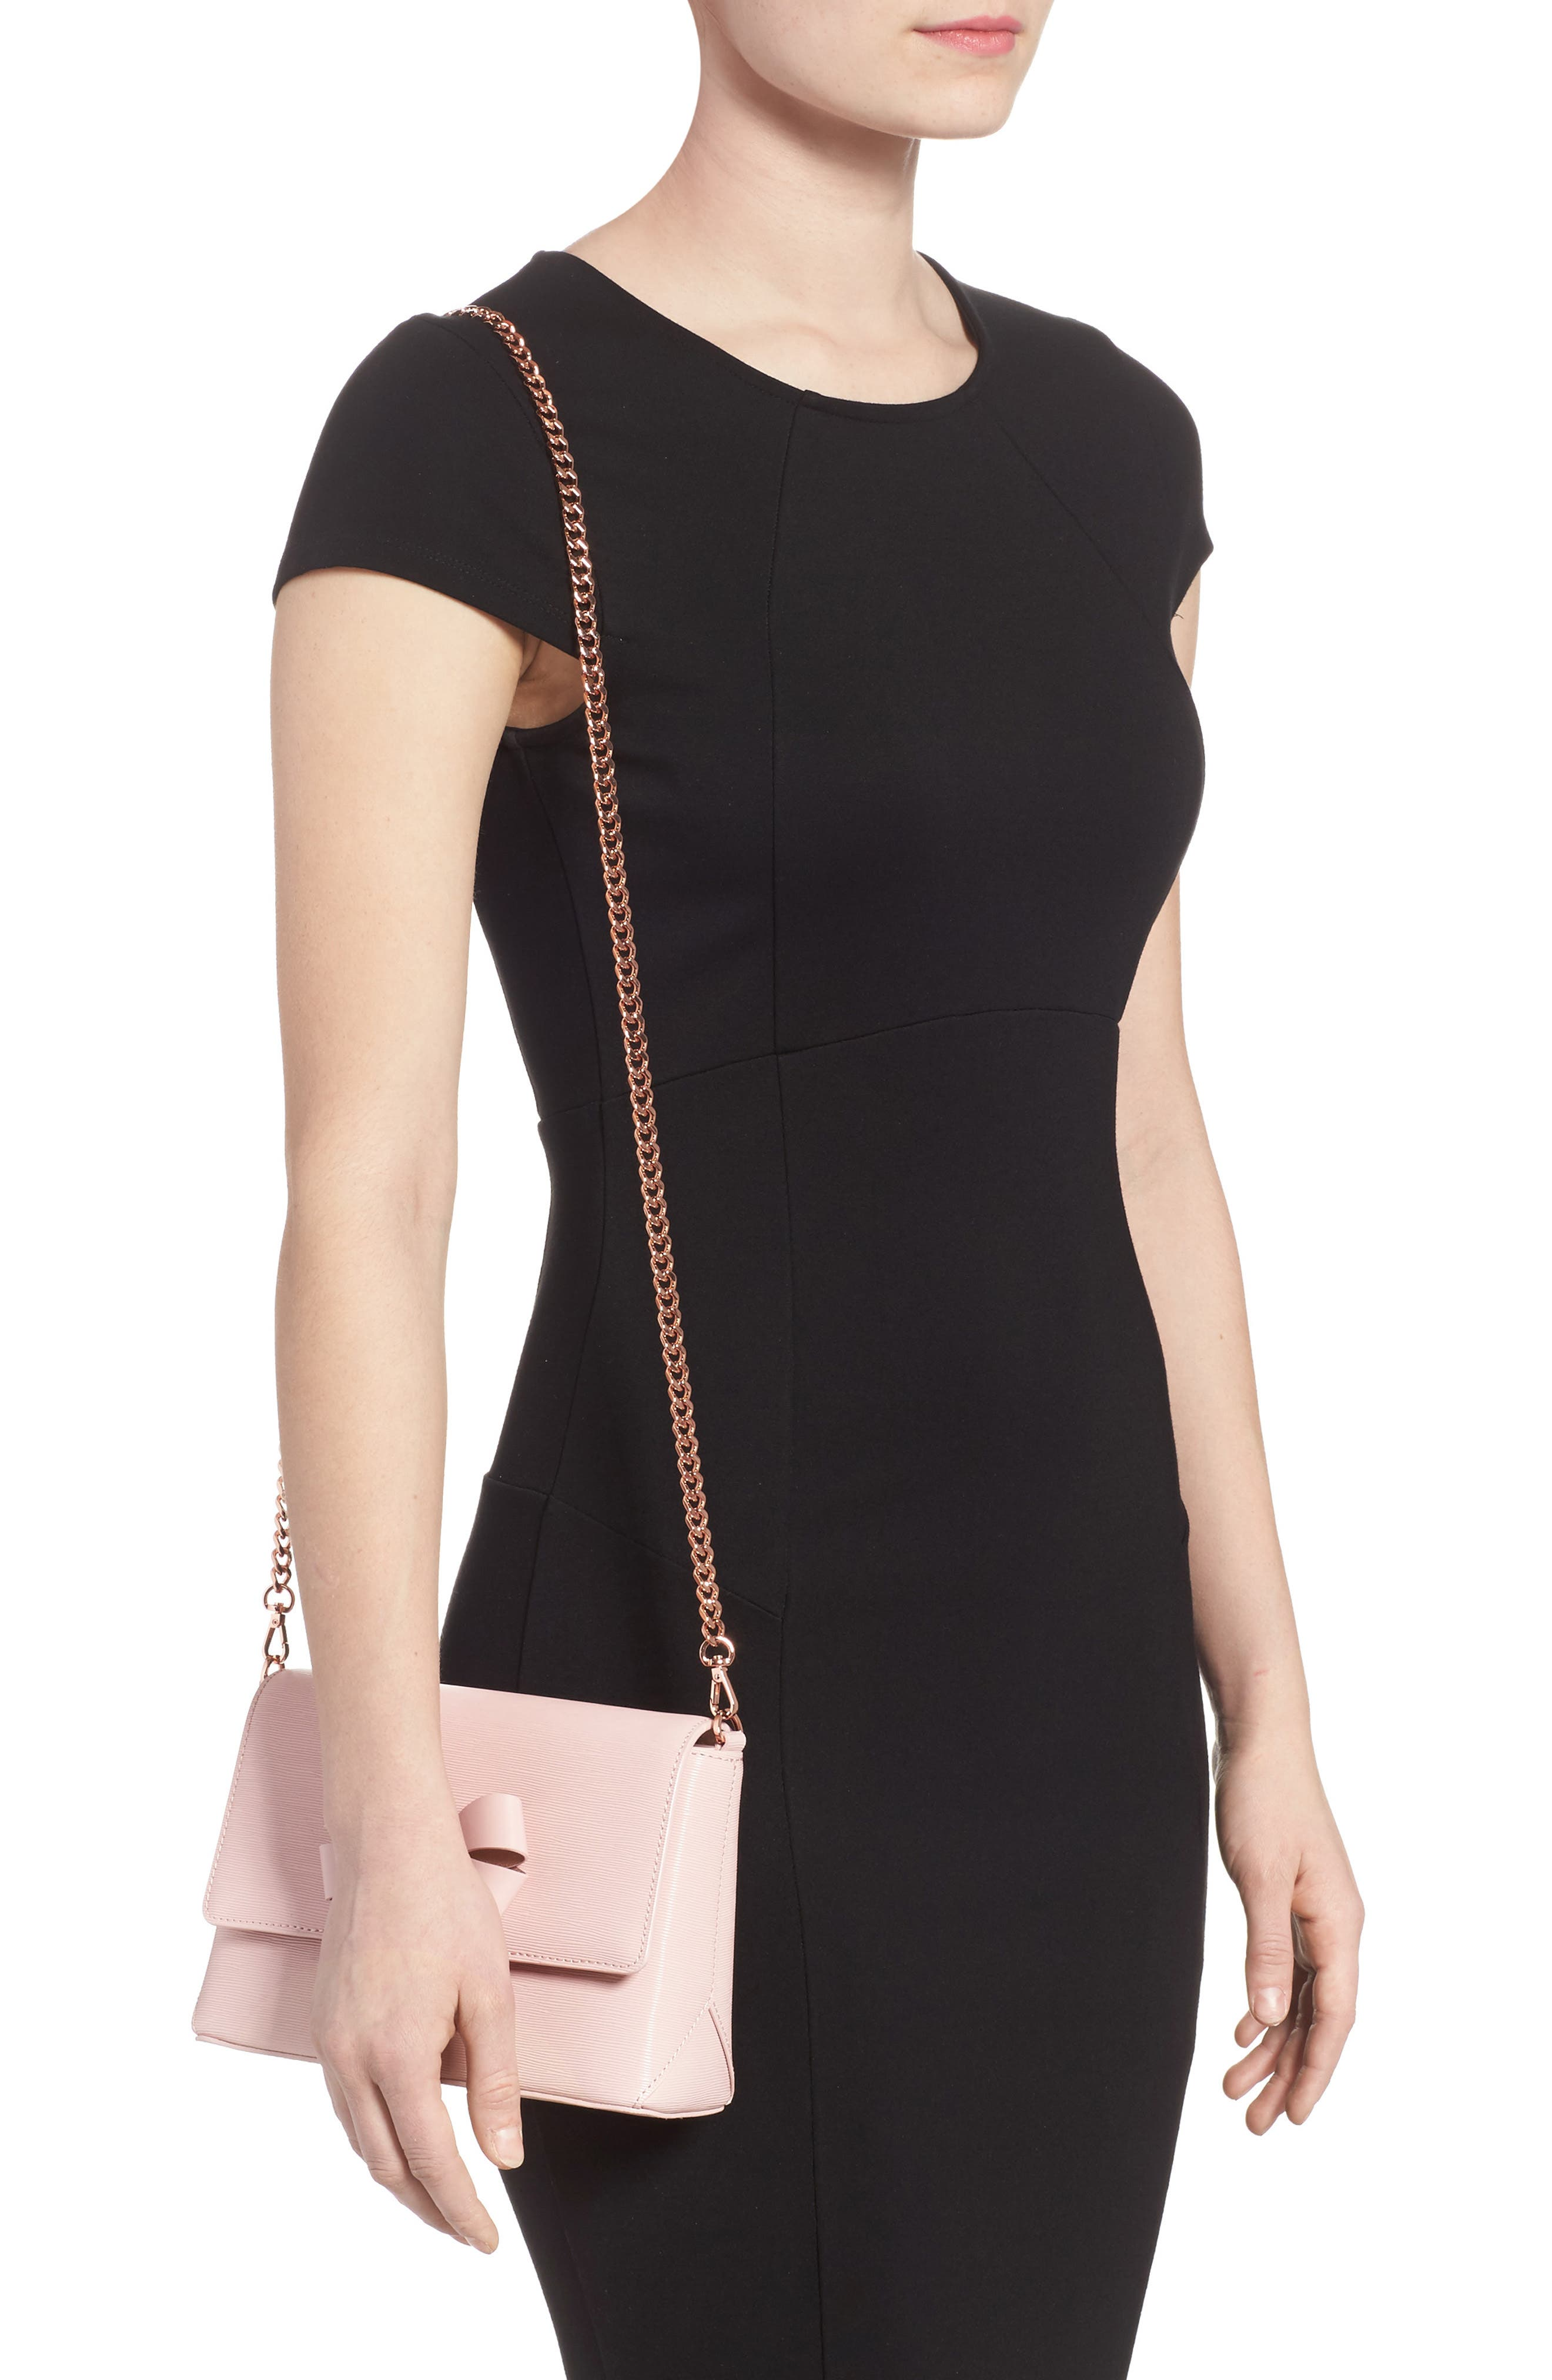 Bowii Bow Mini Bark Leather Crossbody Bag,                             Alternate thumbnail 2, color,                             Light Pink